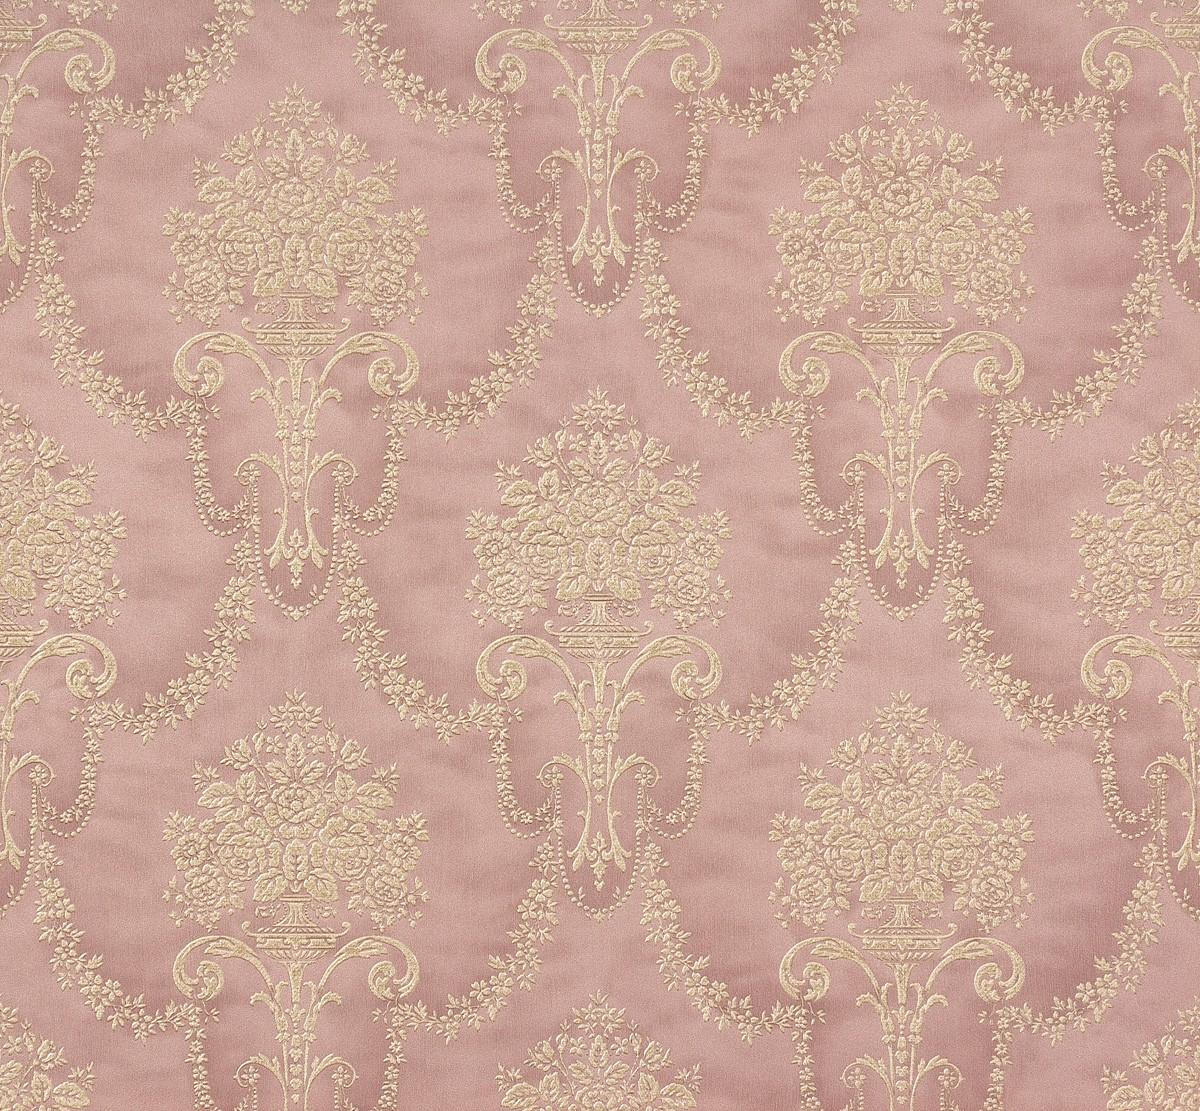 vliestapete rasch trianon barock rosa creme 514971. Black Bedroom Furniture Sets. Home Design Ideas